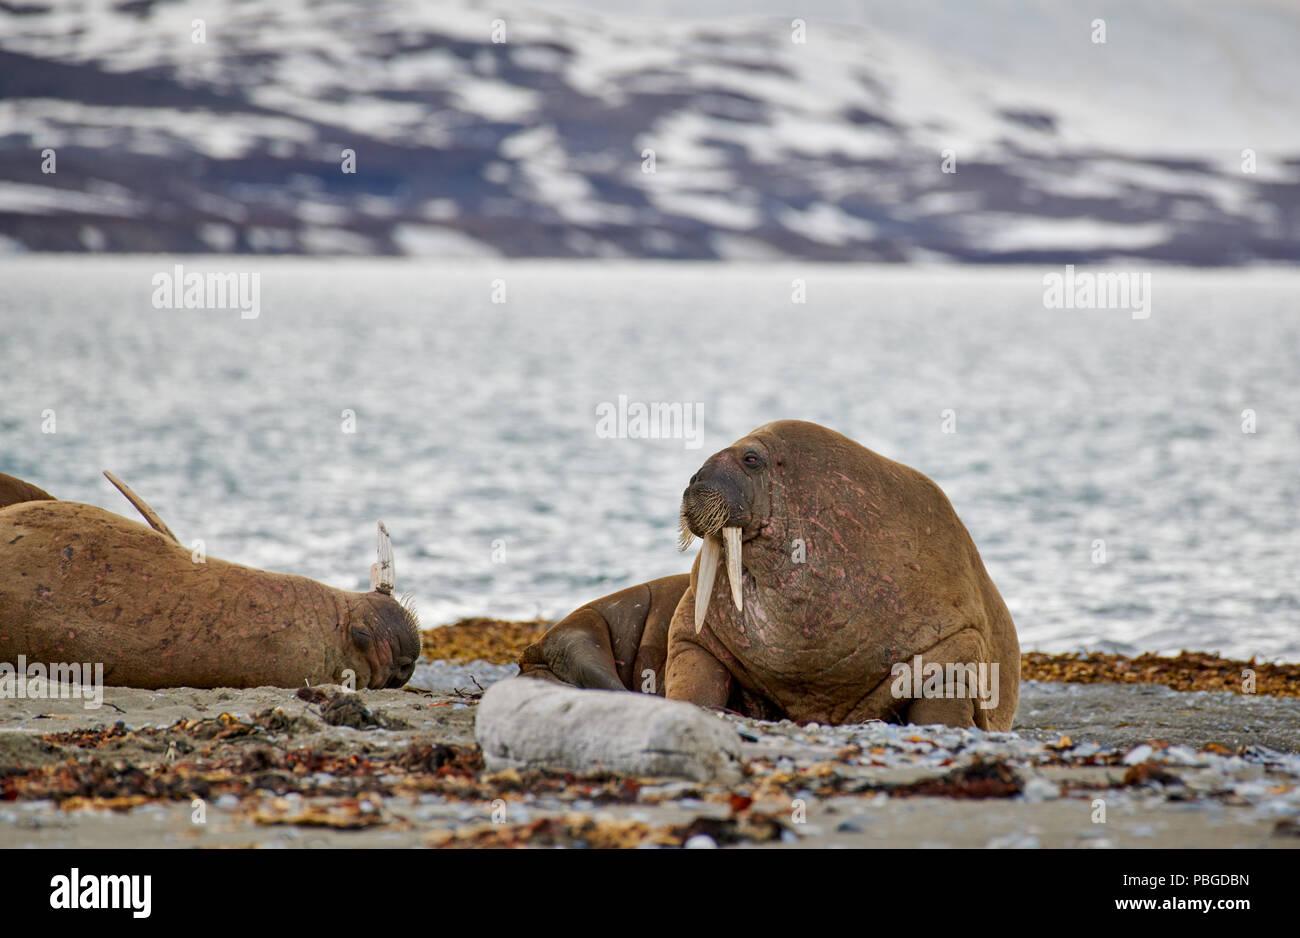 walrus, Odobenus rosmarus, Poolepynten, Svalbard or Spitsbergen, Europe - Stock Image